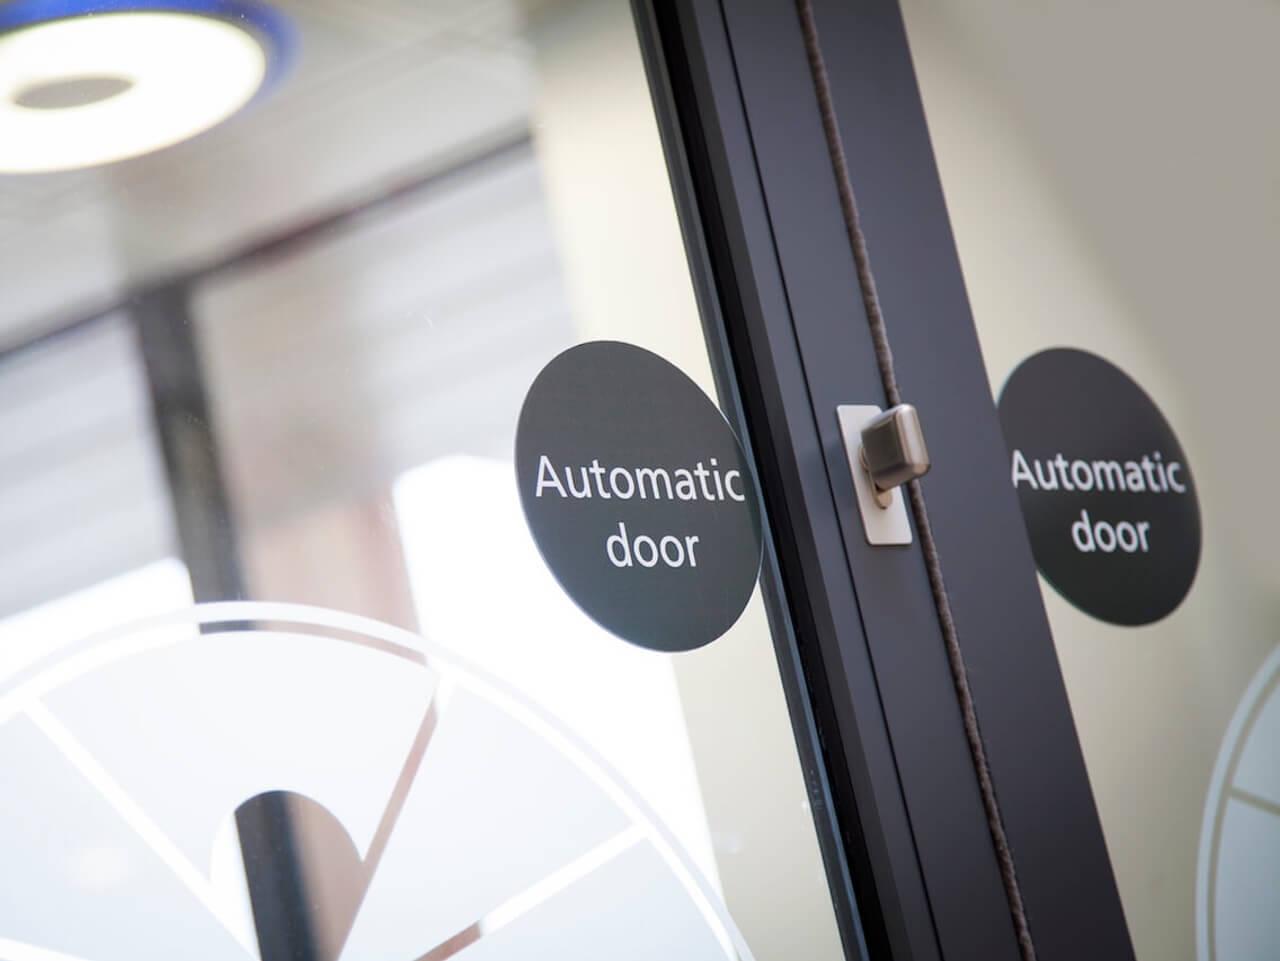 Door manifestation detailing